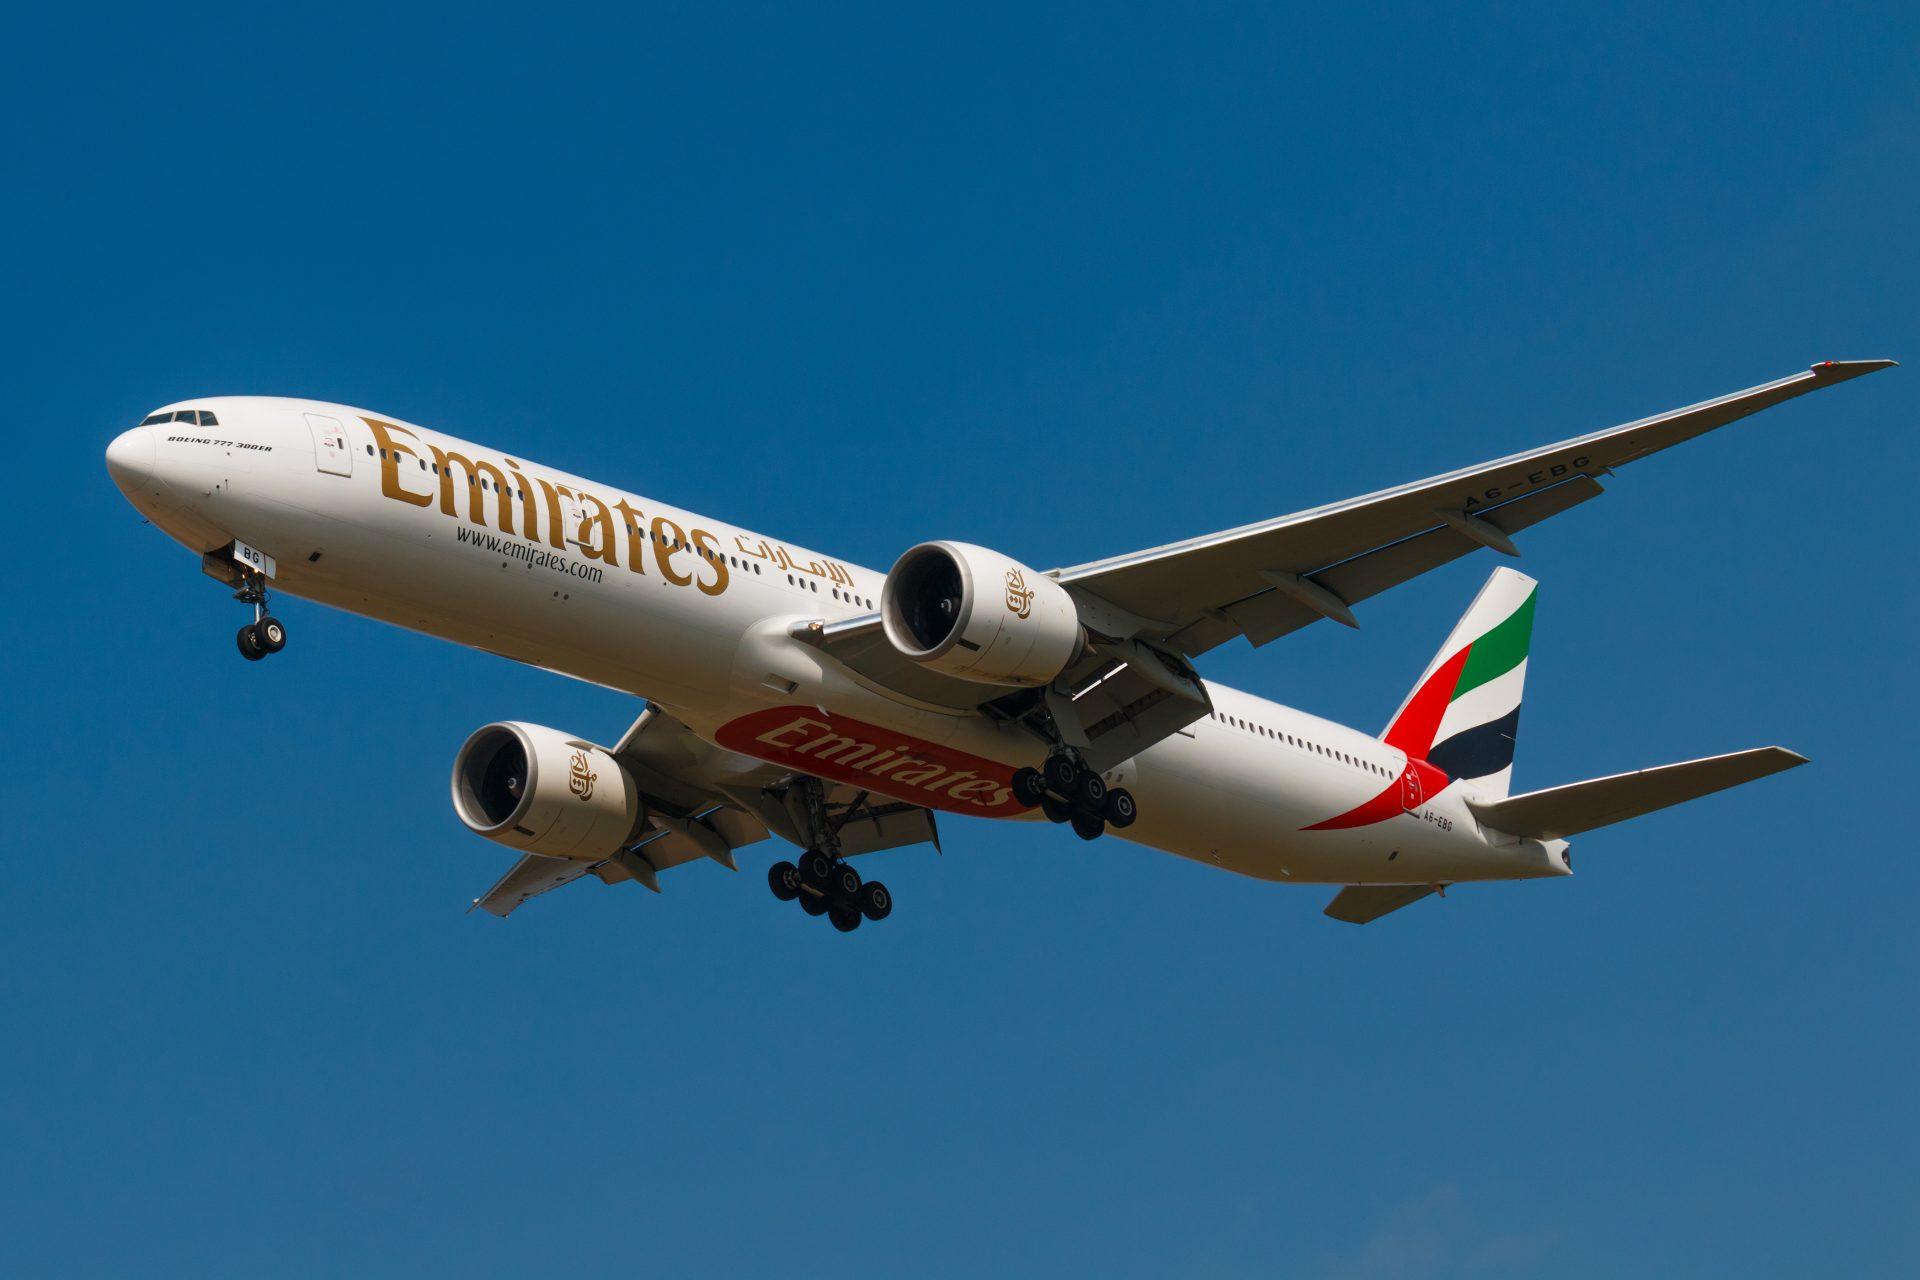 Emirates launches flights from Dubai to Tel Aviv Israel. Credit Rebius : Shutterstock.com